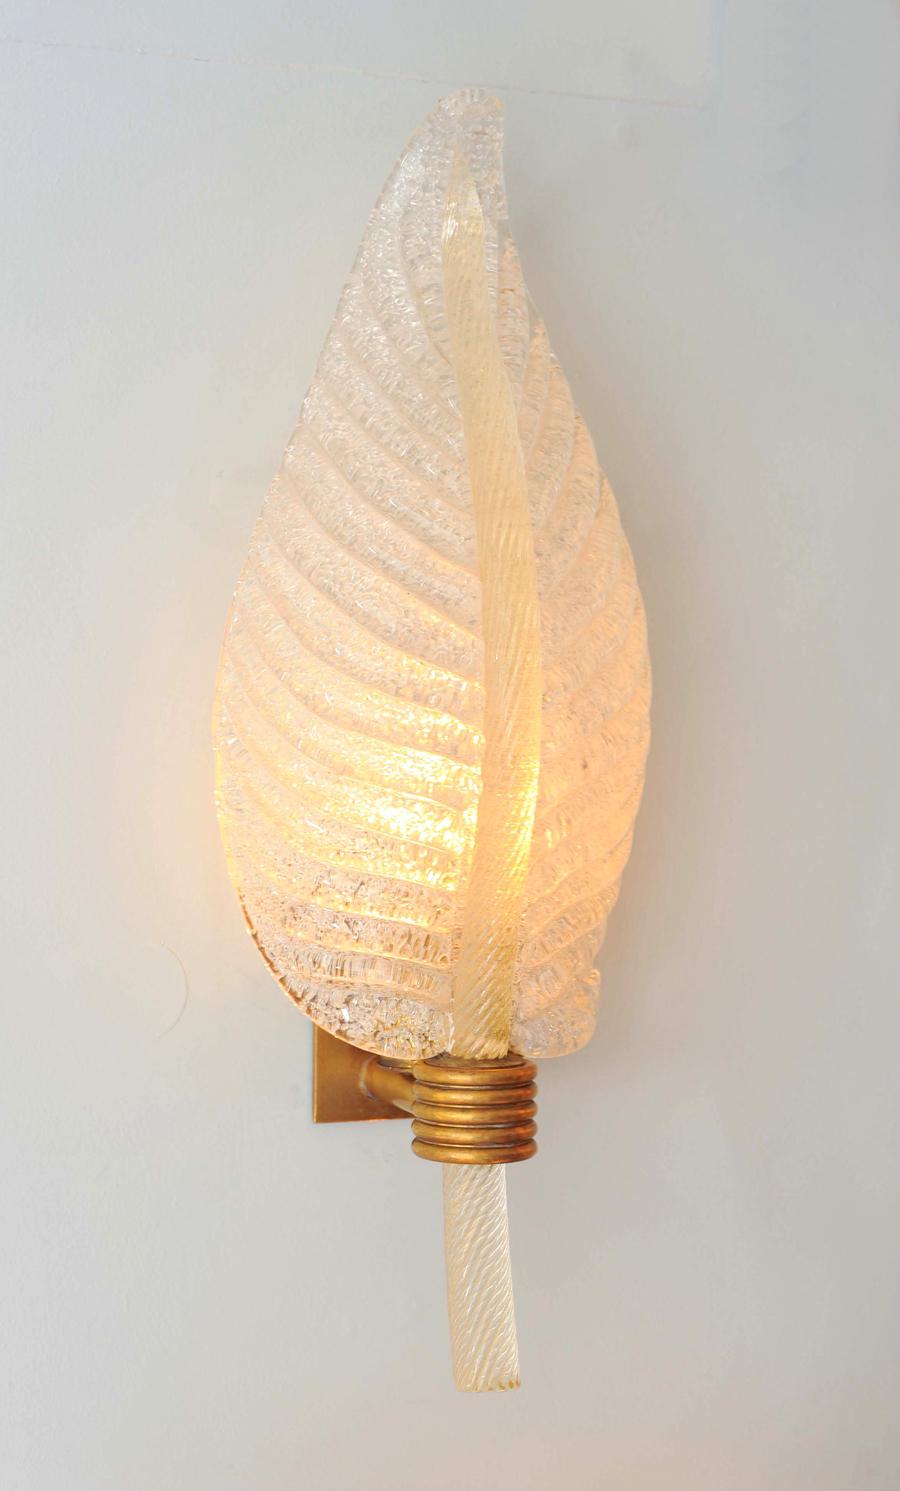 Valerie Wade Lw608 Pair 1950S Italian Leaf Wall Lights 02